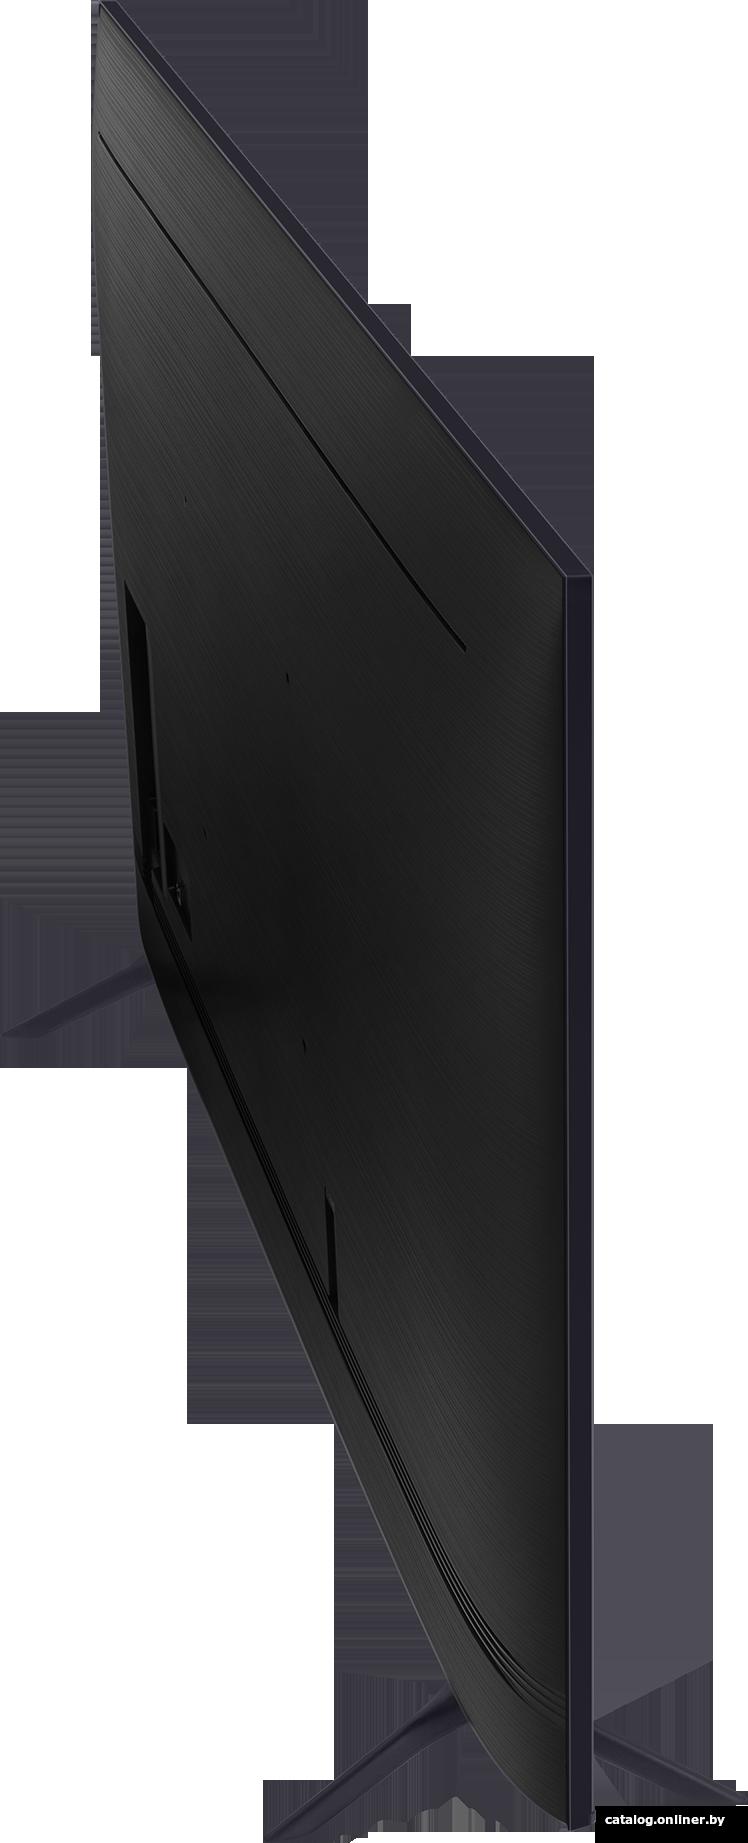 Samsung UE50AU7100U Image #8